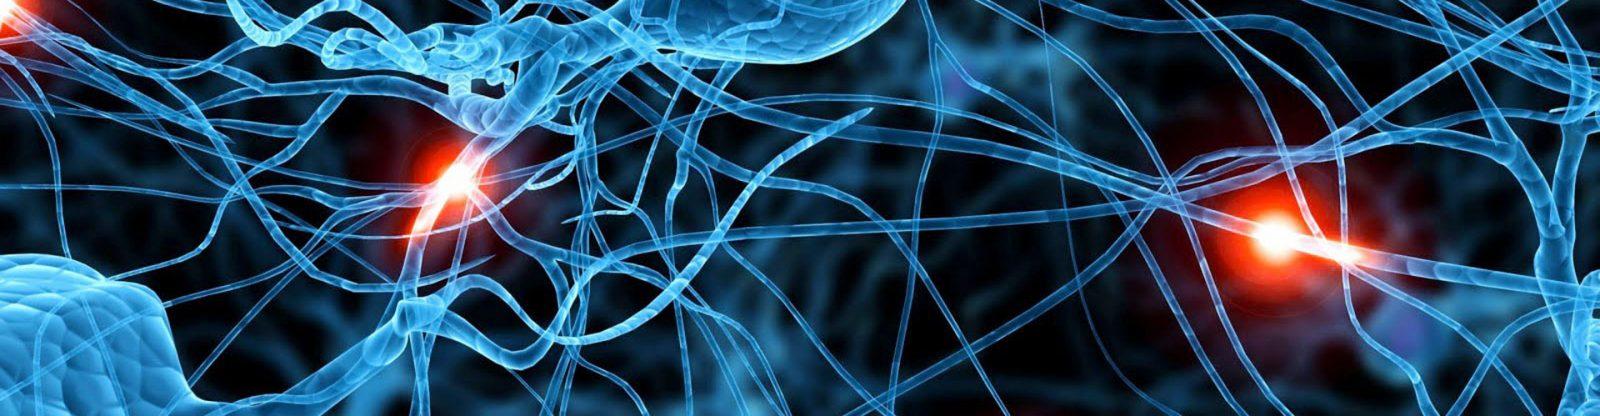 neurone-sinsec